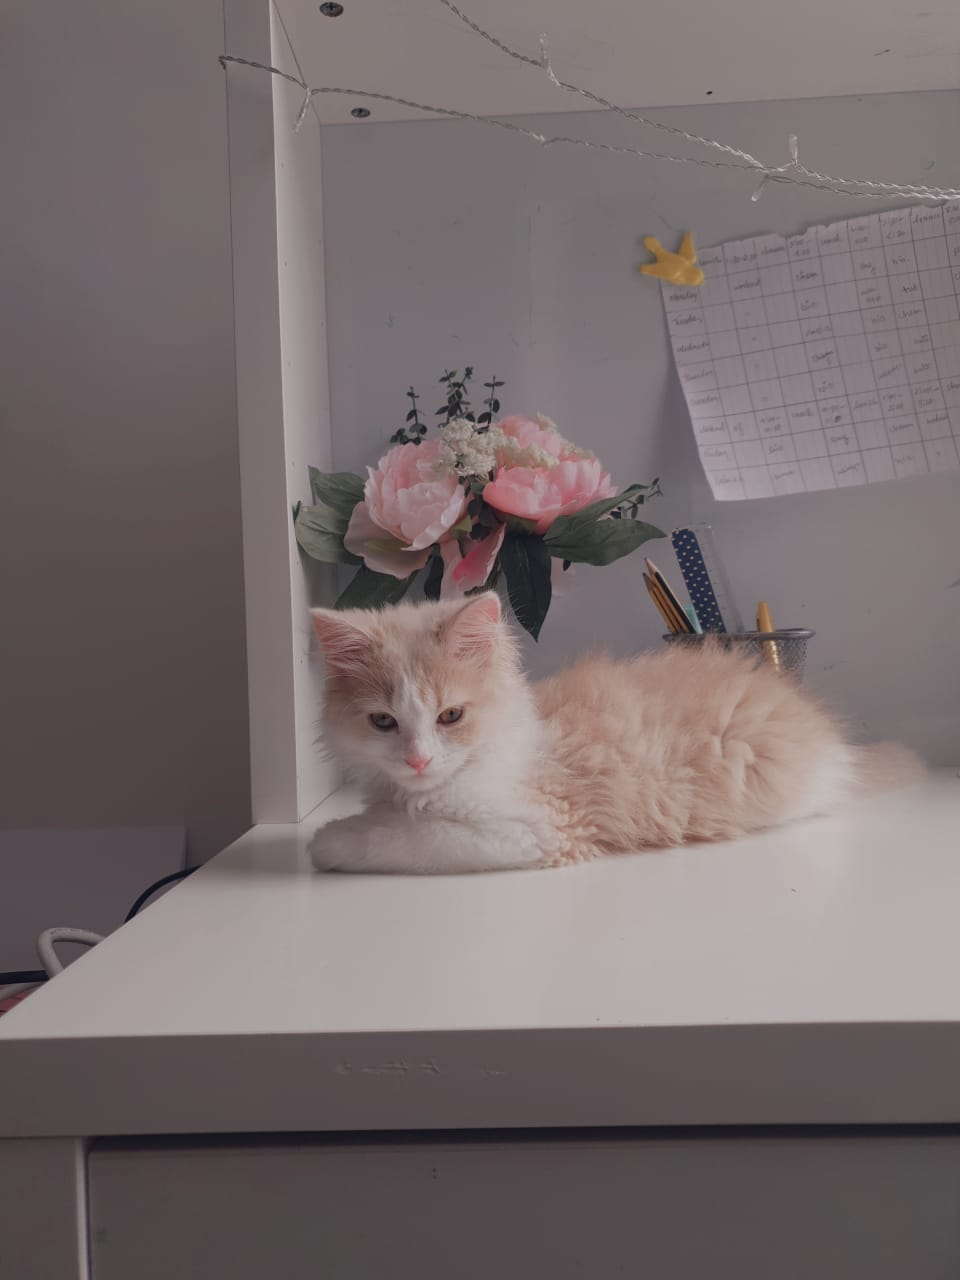 Cute kitten 4.5 months for sale